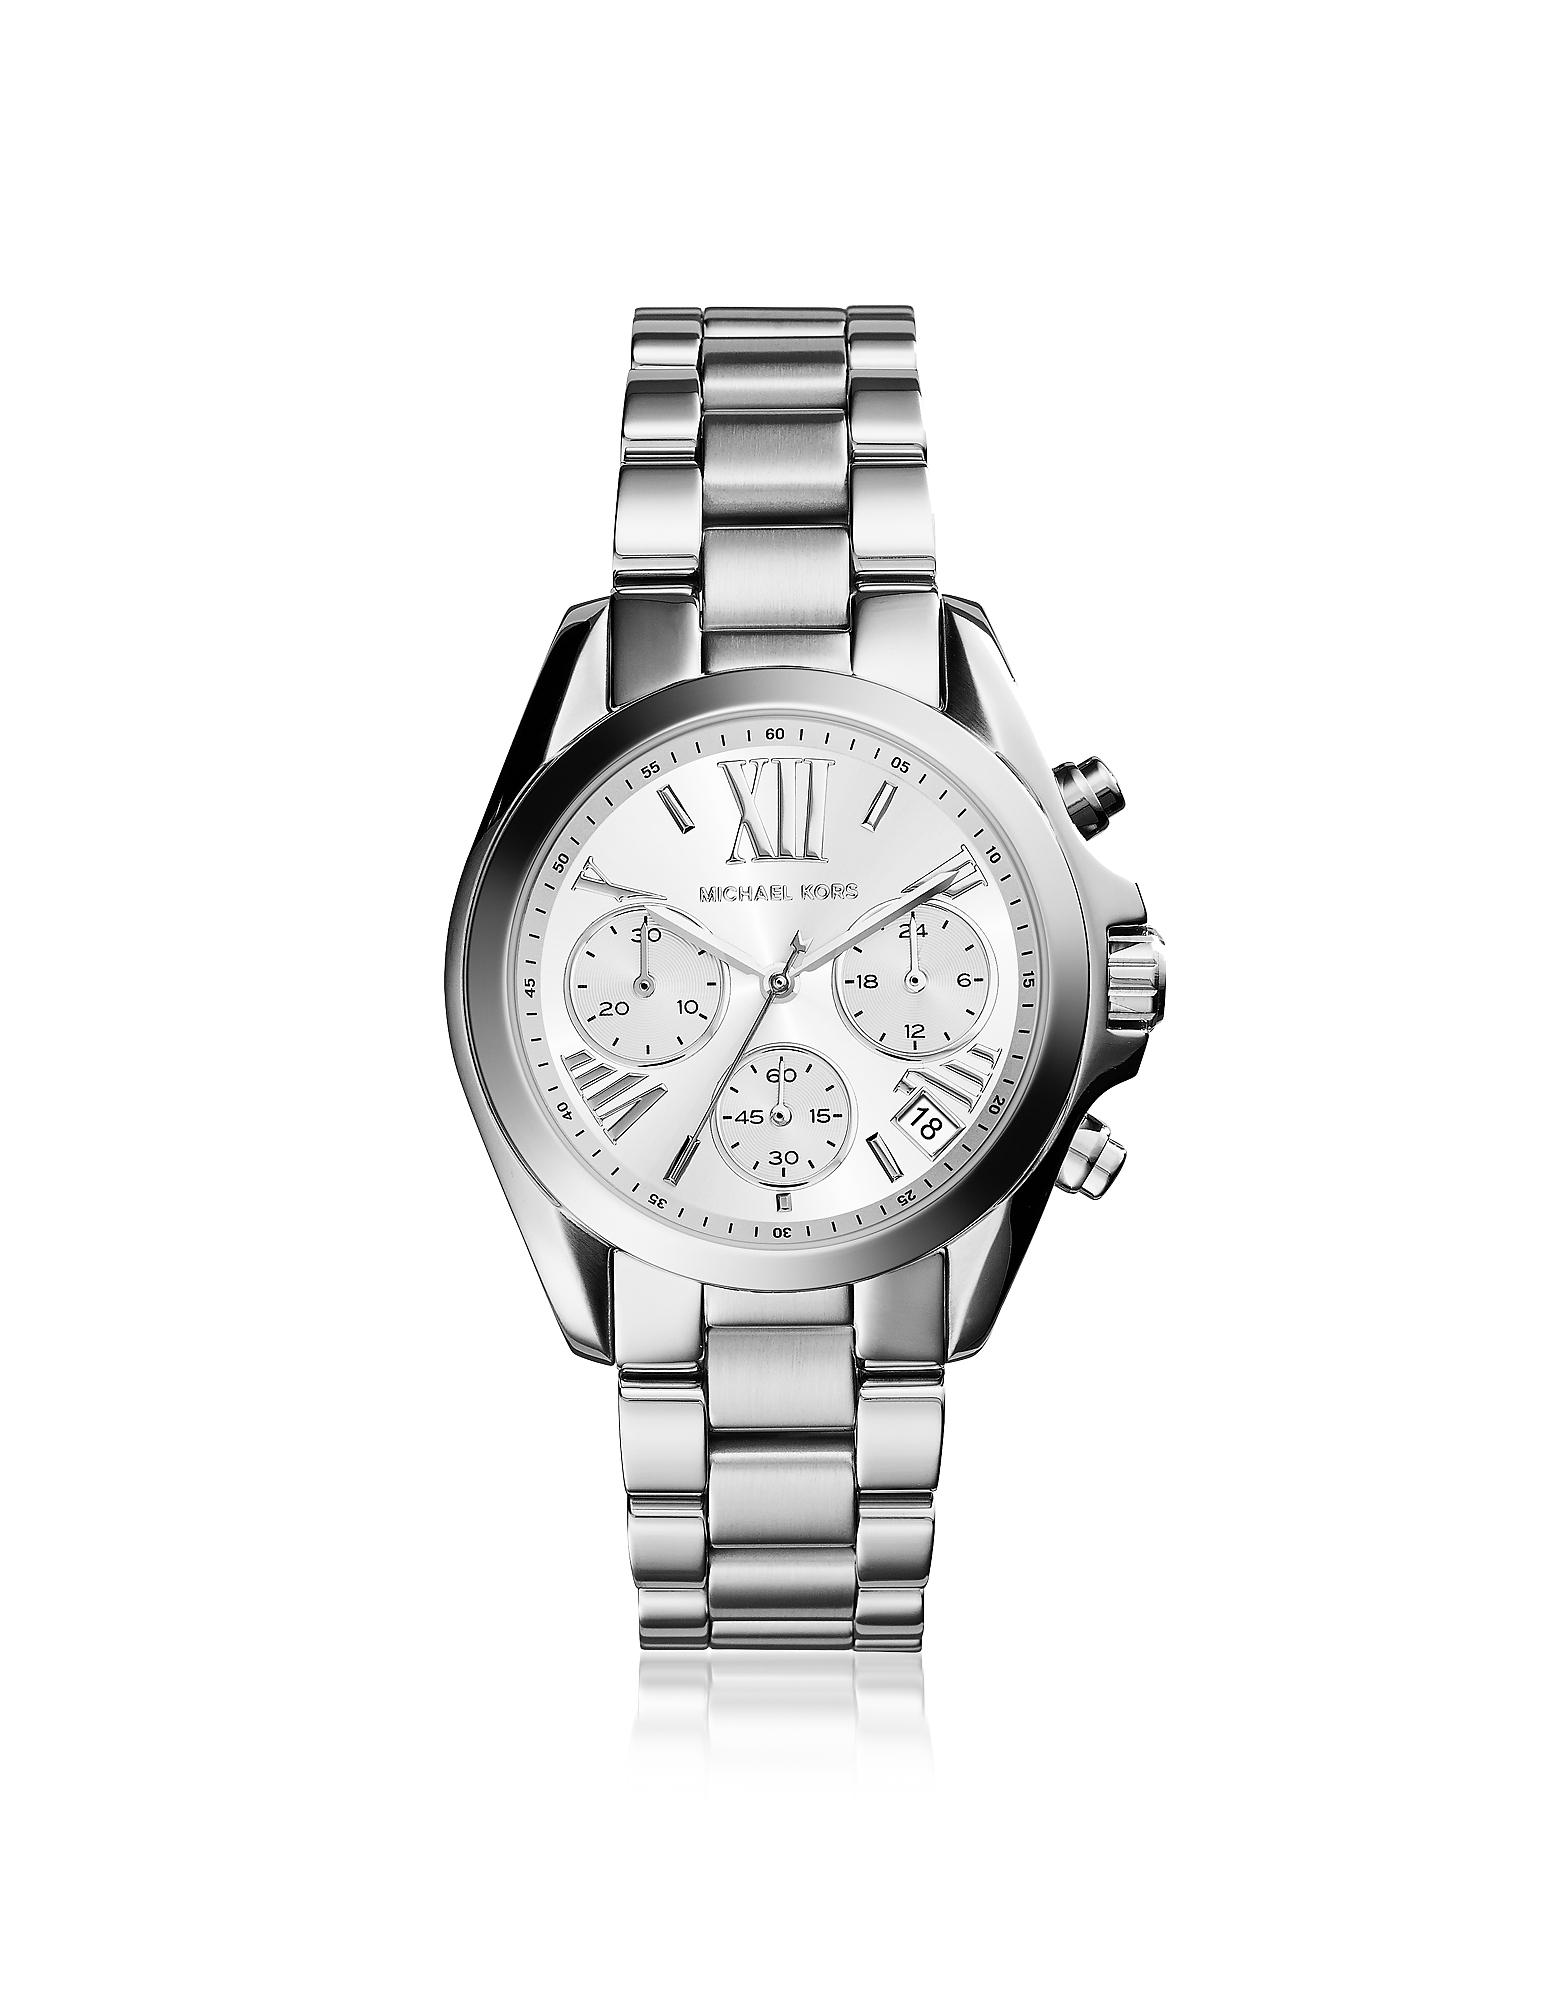 Michael Kors Women's Watches, Mini Bradshaw Silver Tone Women's Watch